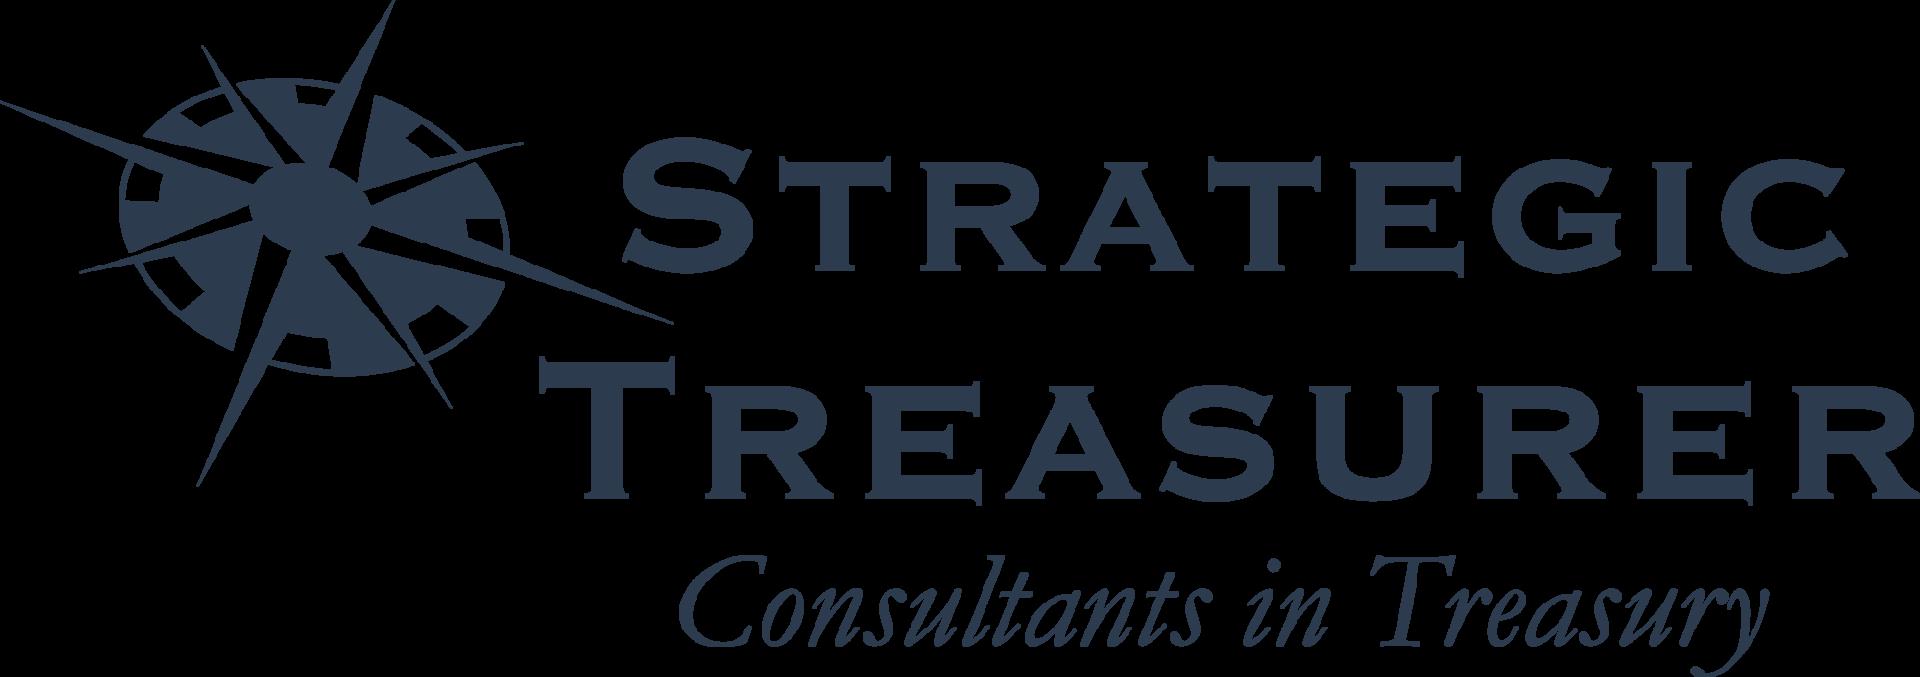 Strategic Treasurer, LLC